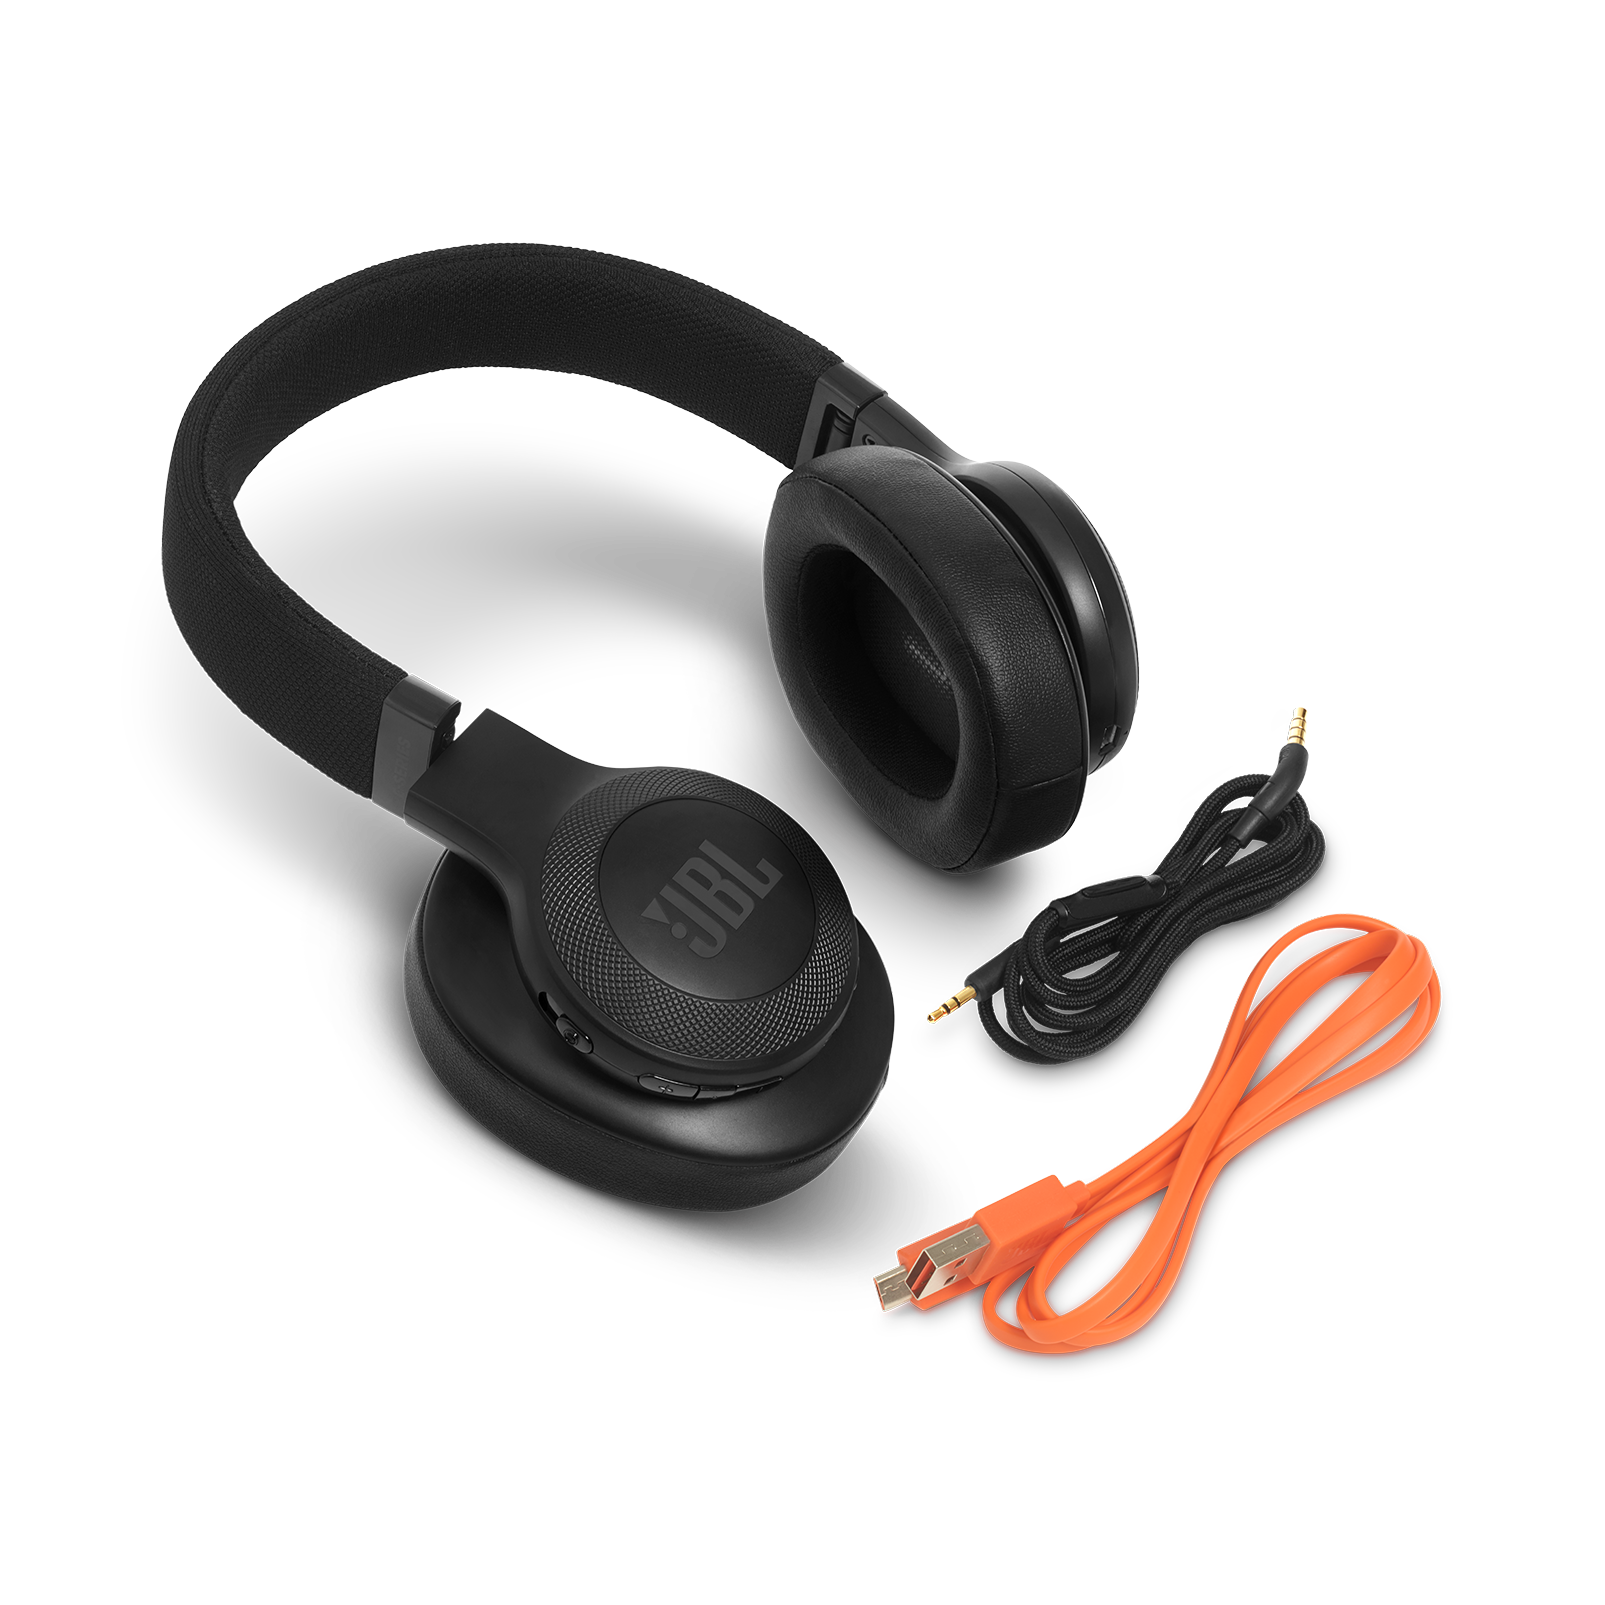 773e78acfc7 JBL E55BT | Wireless over-ear headphones